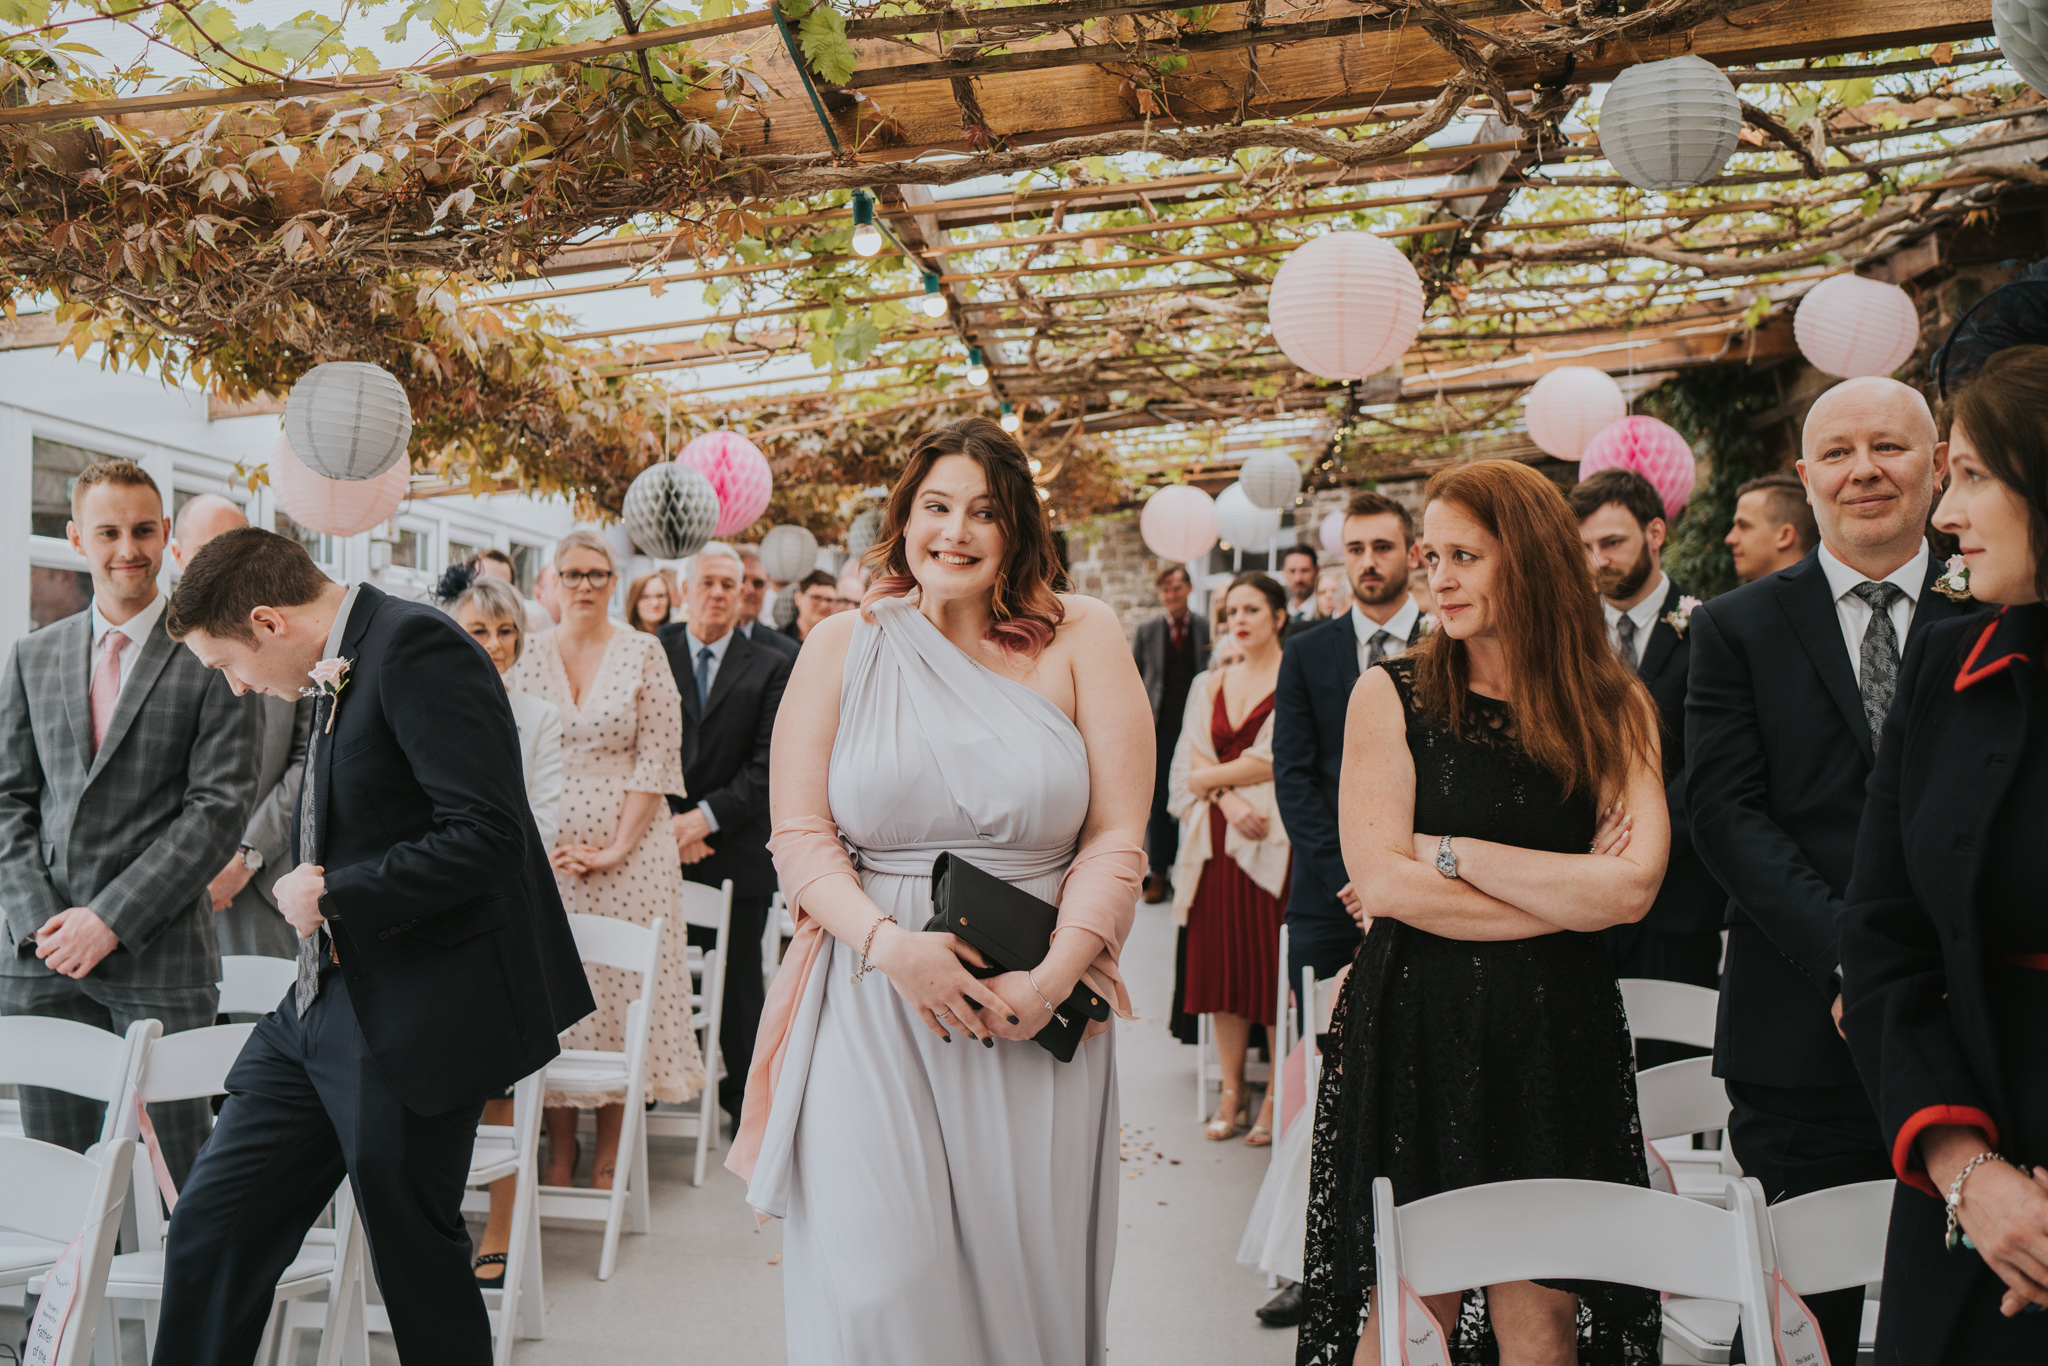 grace-sam-old-barn-clovelly-devon-wedding-photographer-grace-elizabeth-essex-suffolk-norfolk-wedding-photographer (40 of 132).jpg